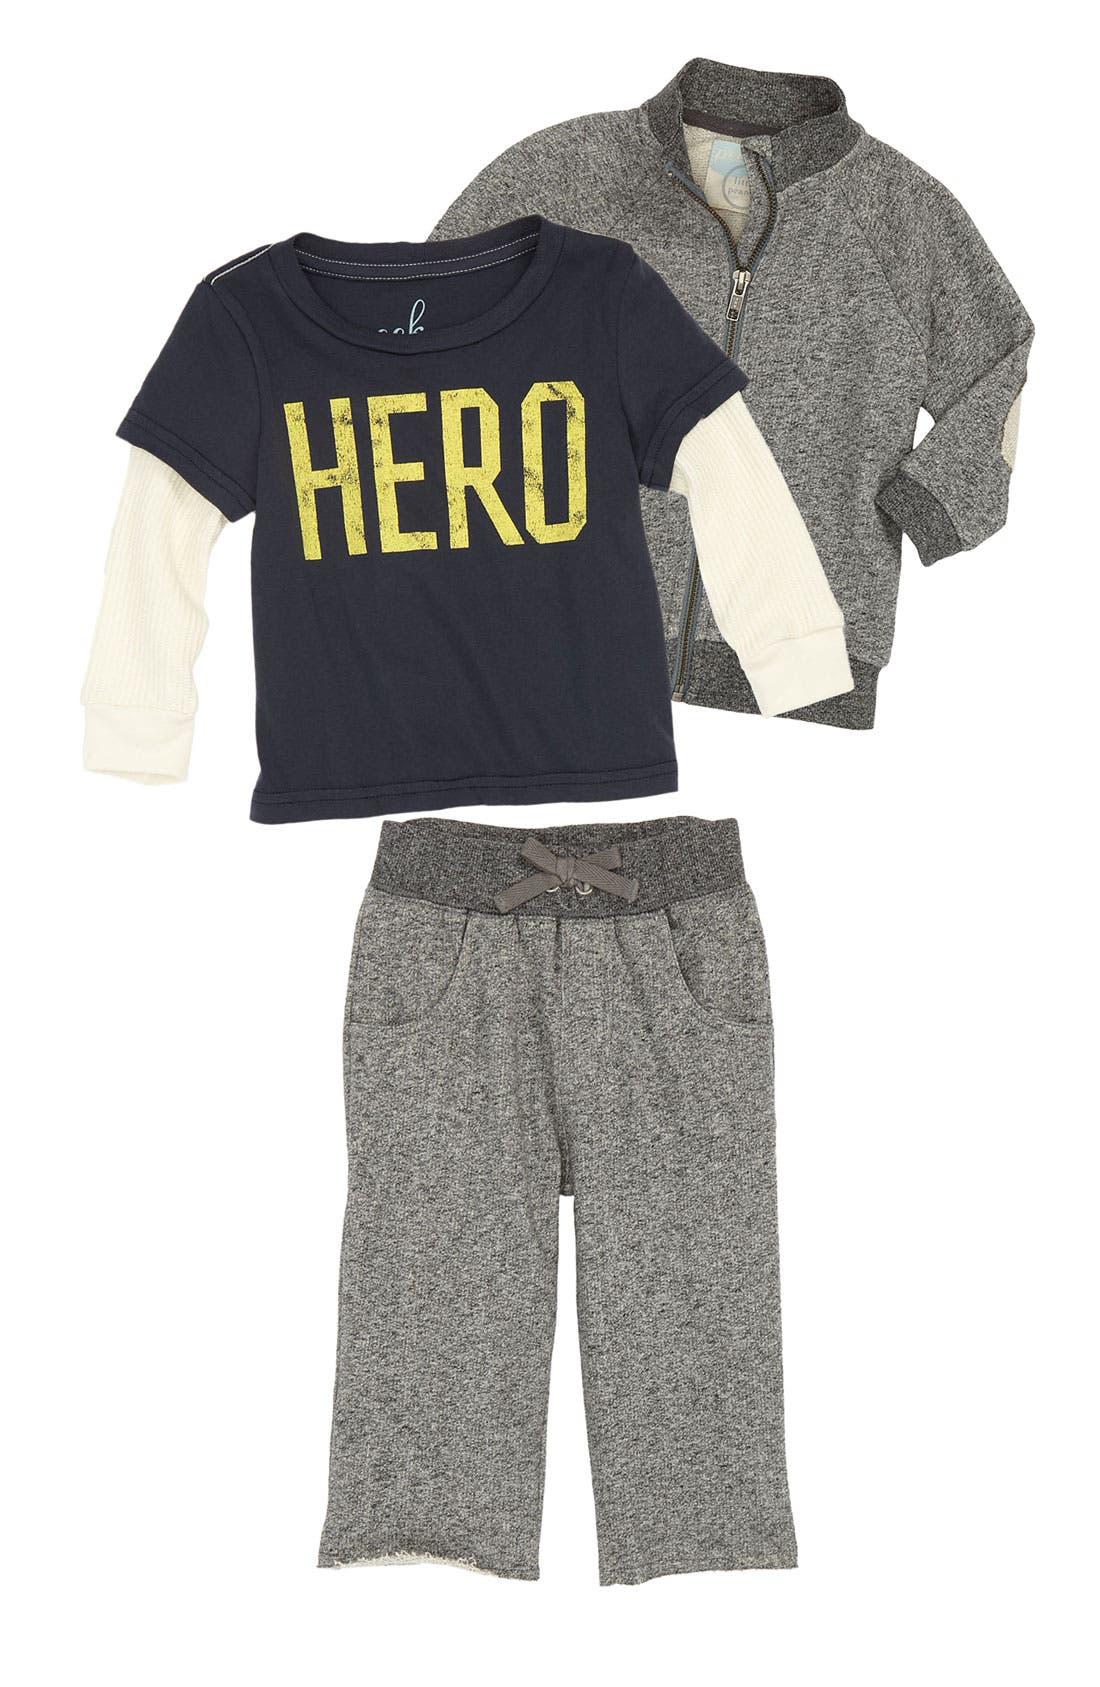 Main Image - Peek Sweater, Tee & Pants (Infant)